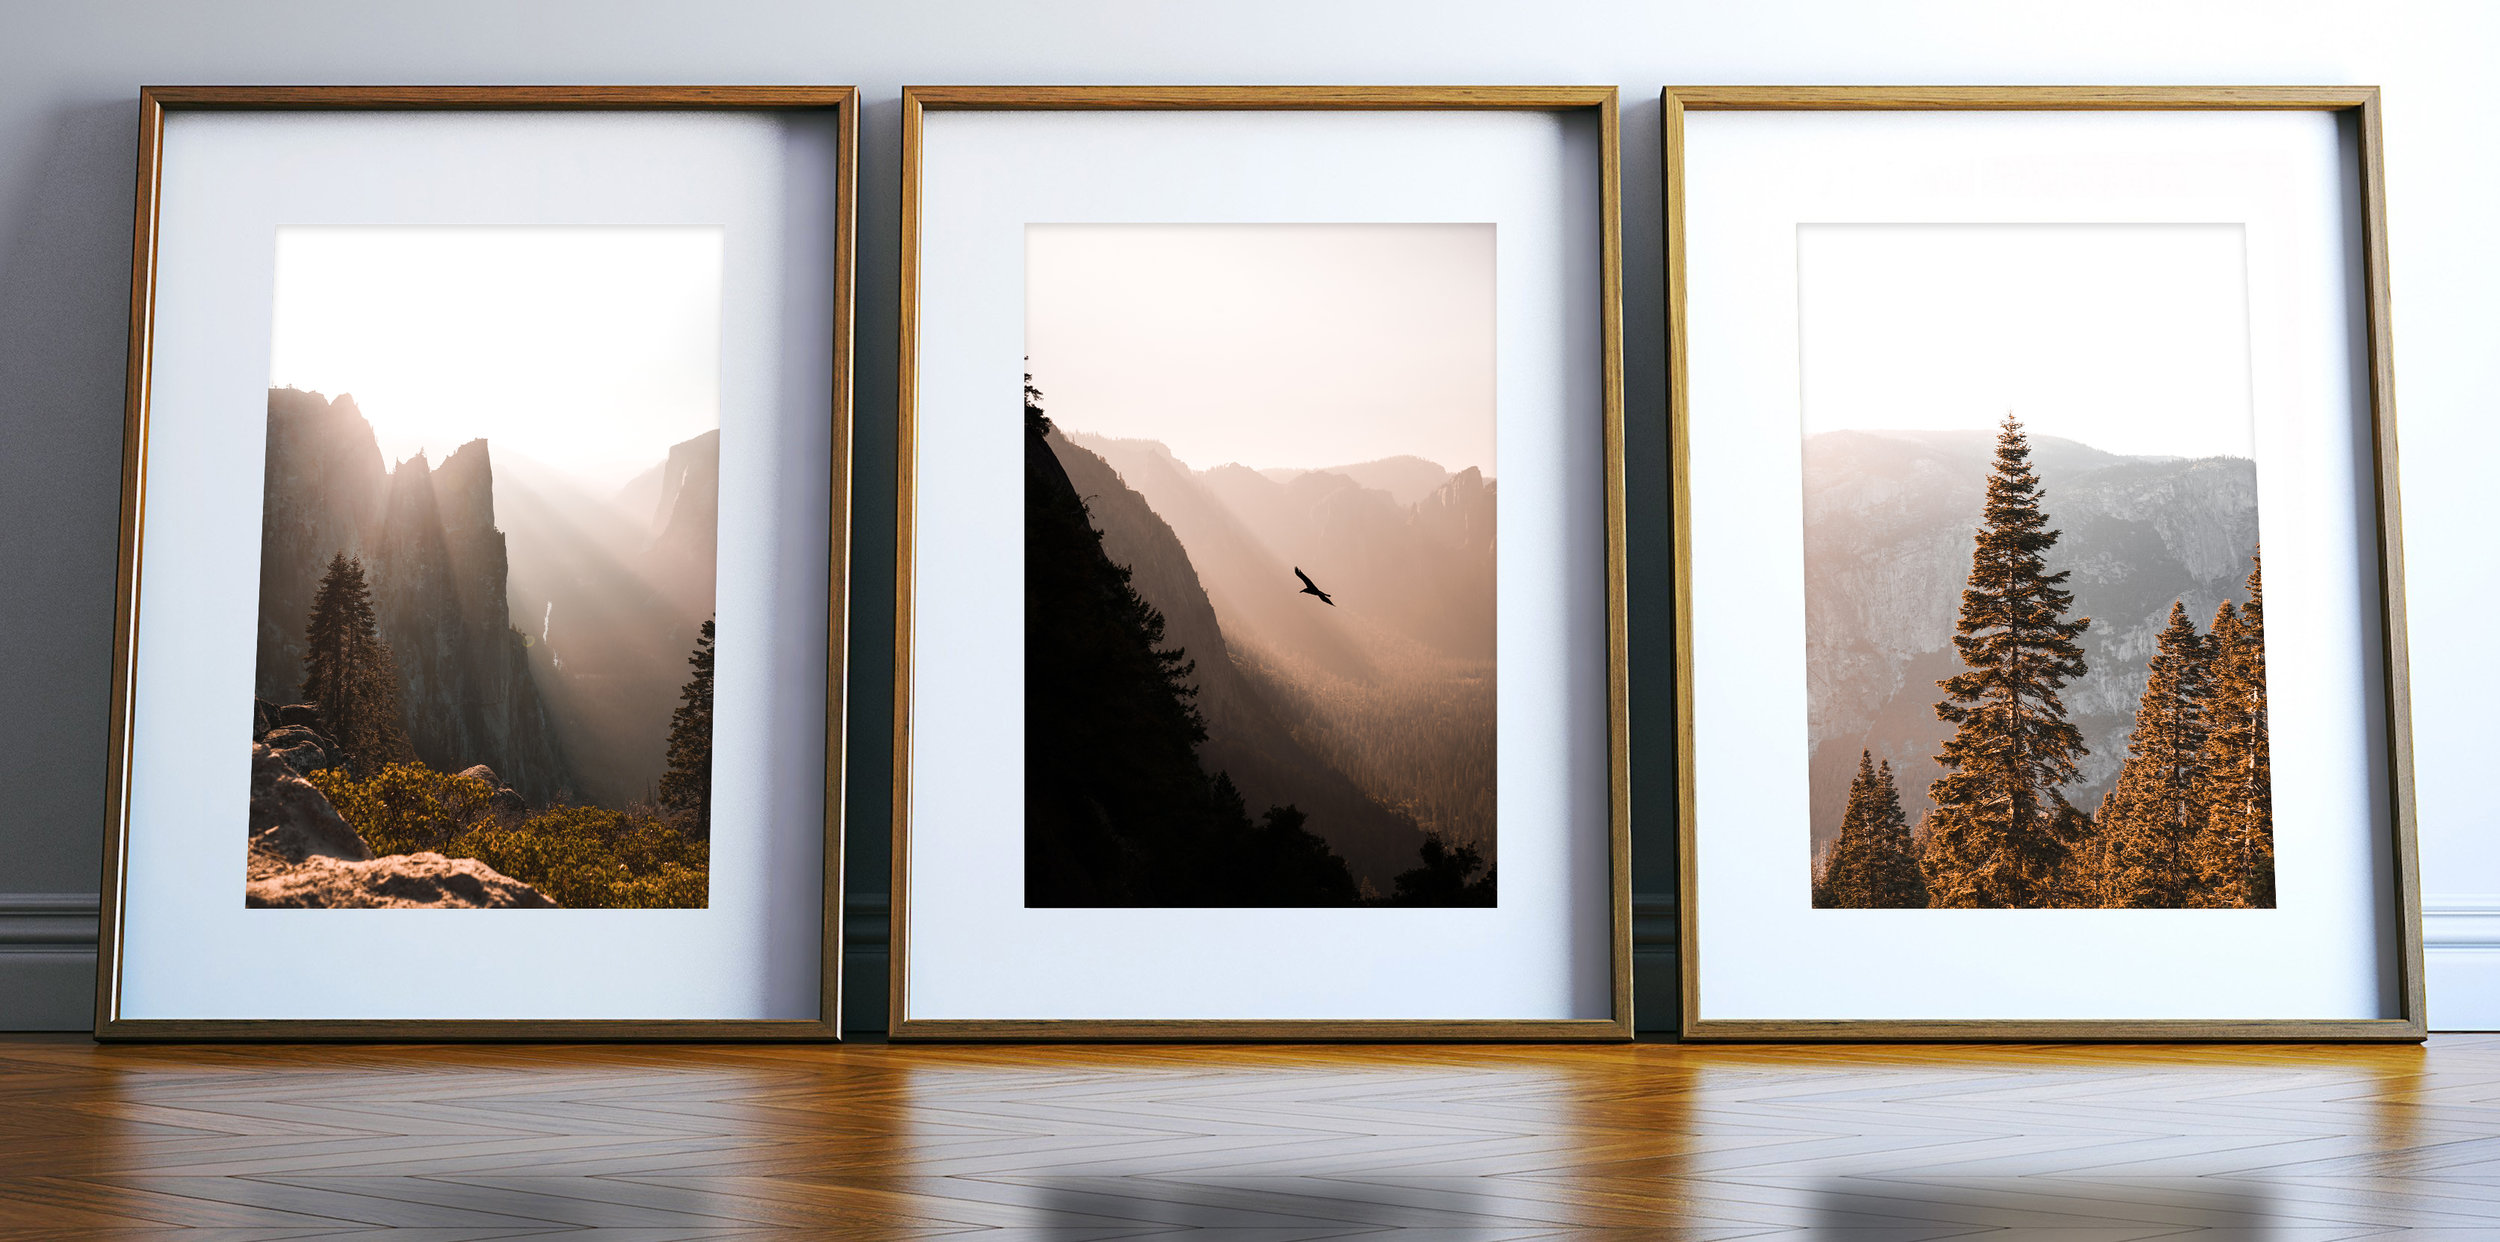 Seb-Zanella-posters04.jpg